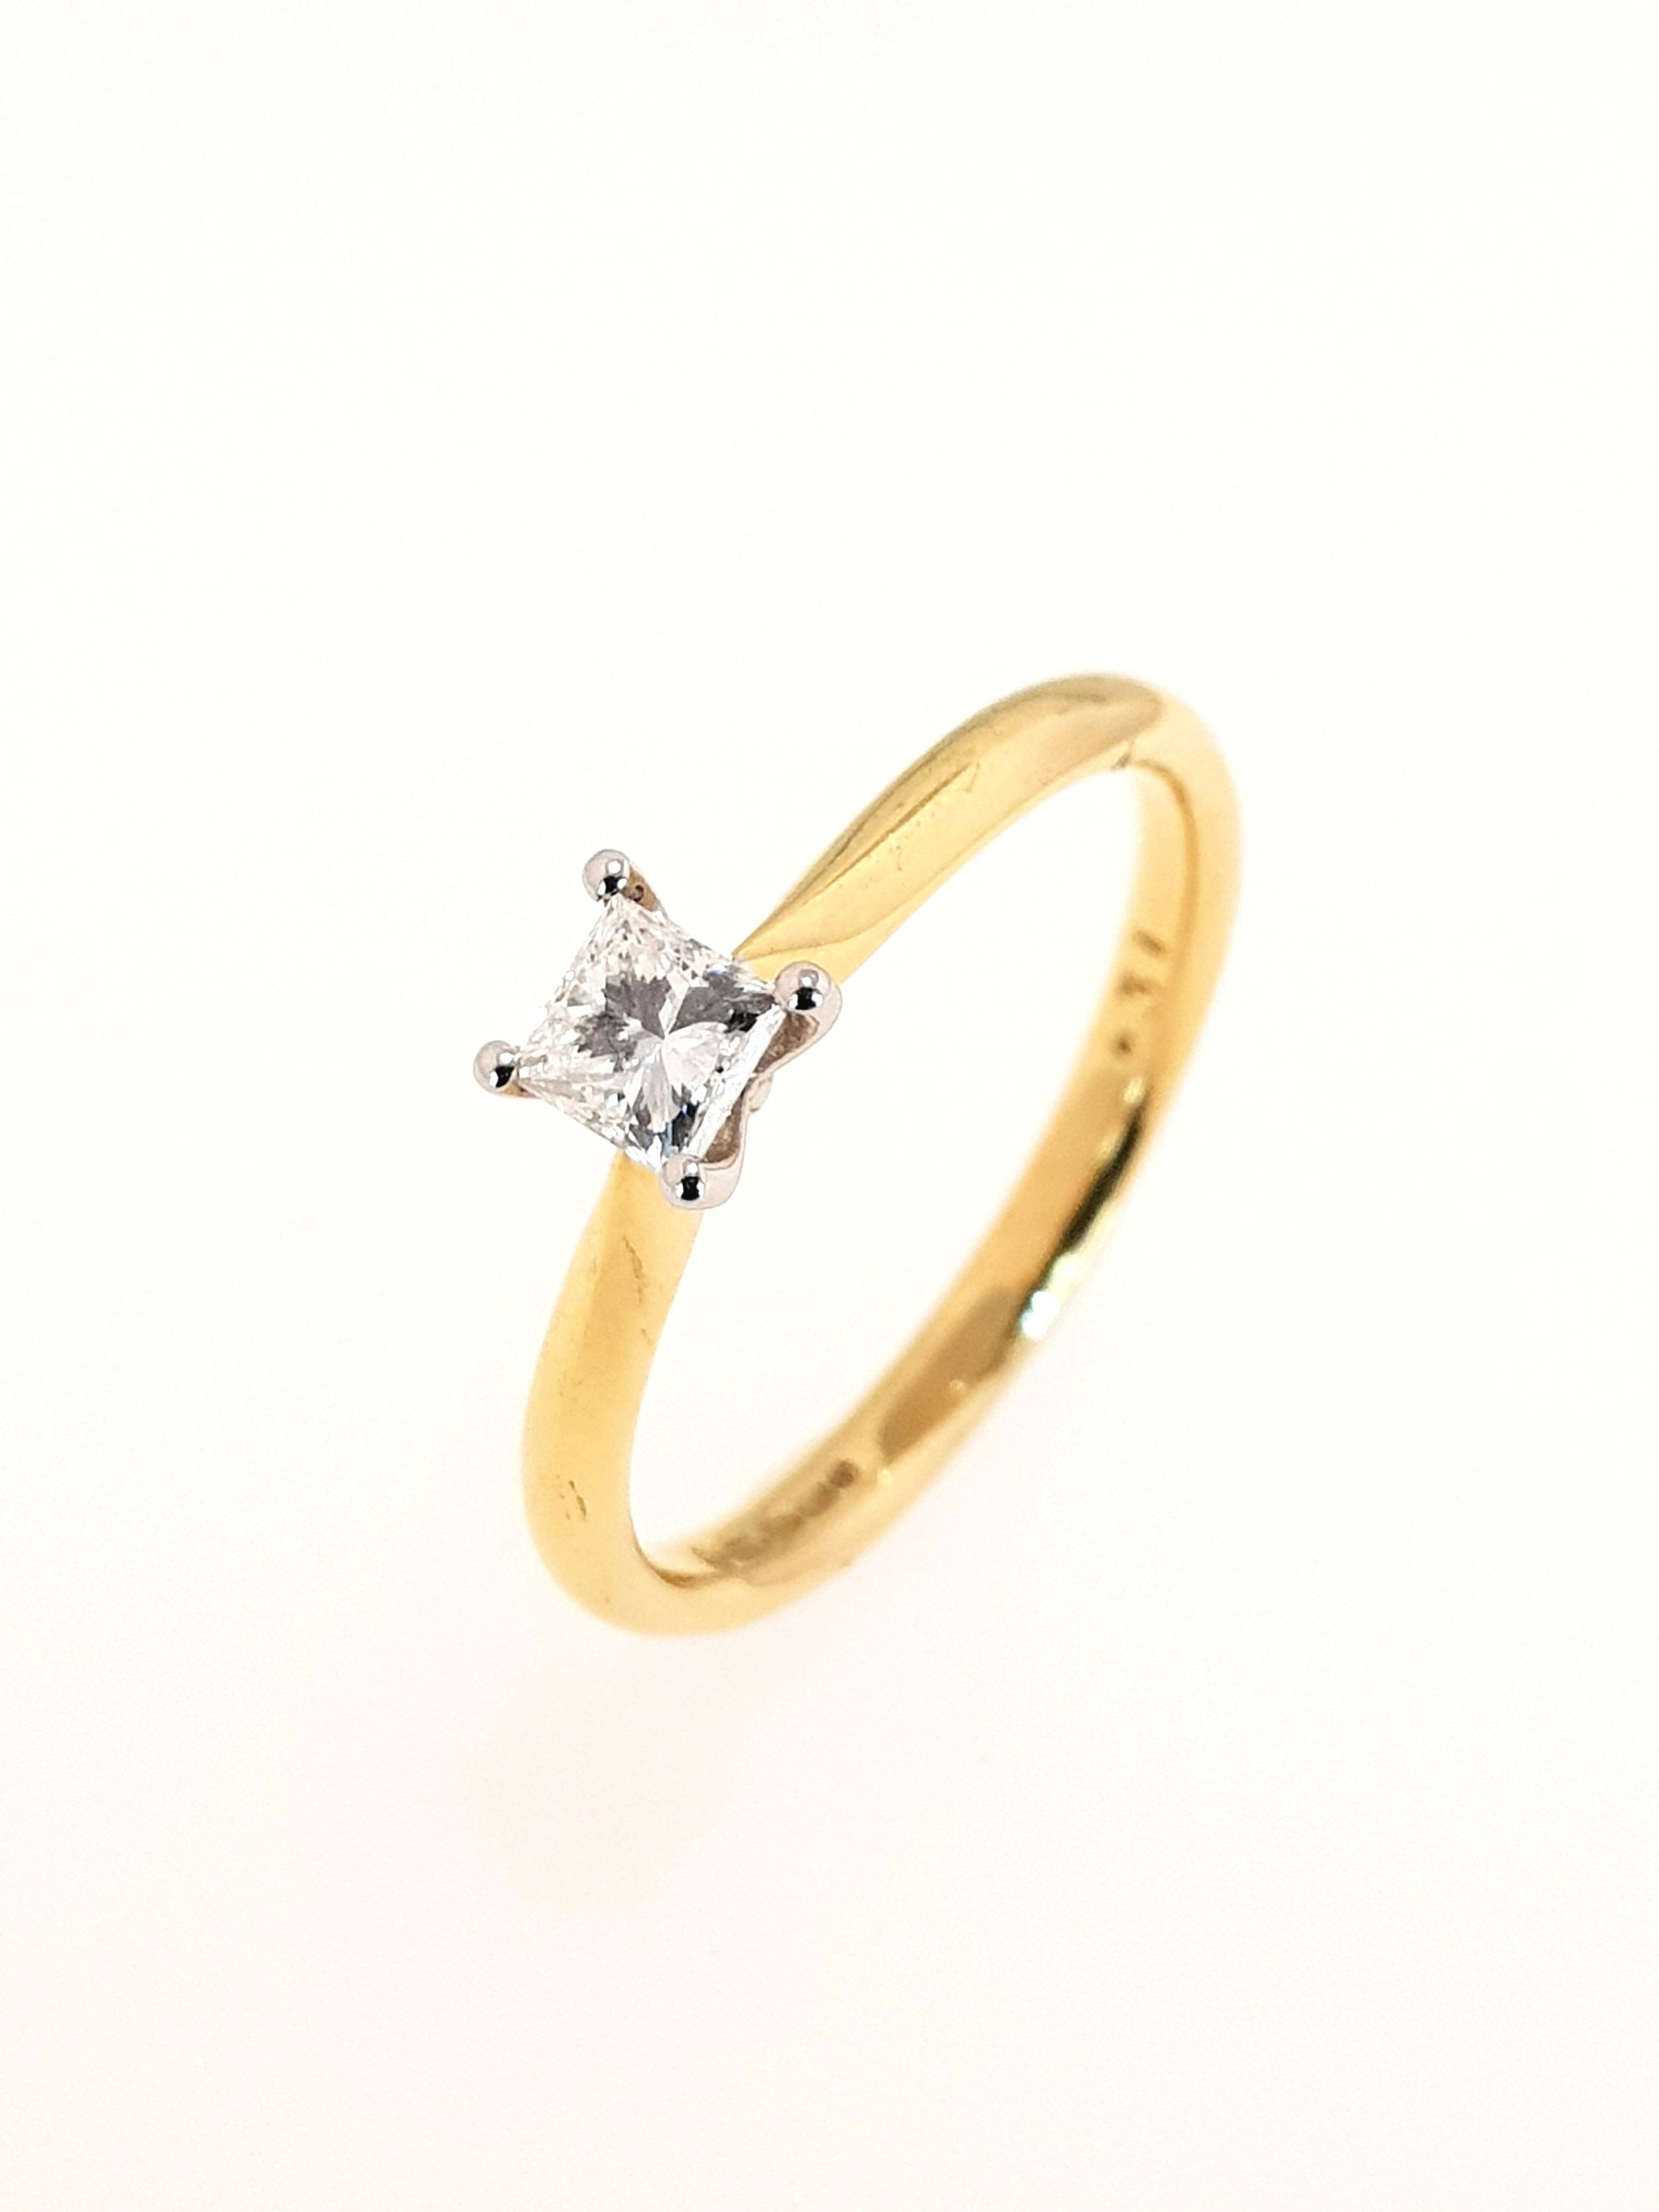 18ct Yellow Gold Diamond Ring, Princess Cut  .31ct, G, VS1  Stock Code: N8340  £1400